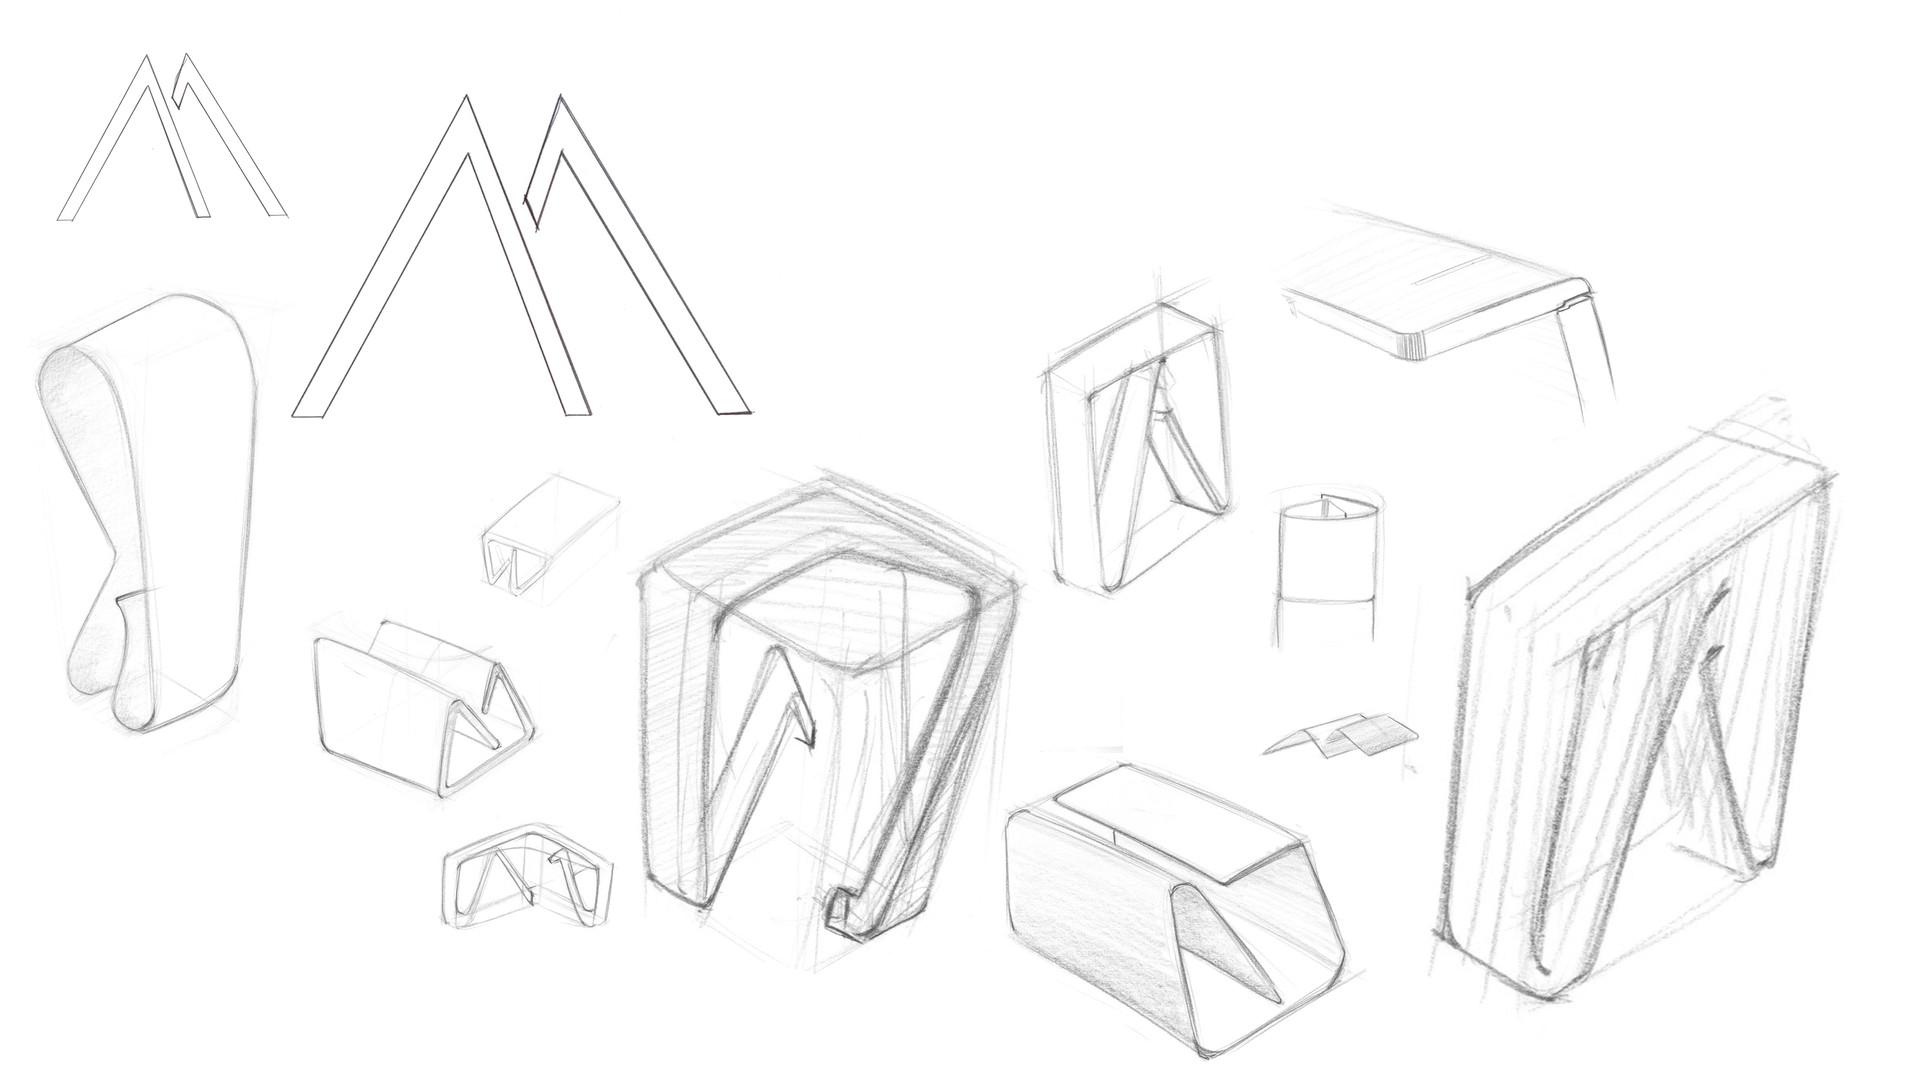 IDD_Studio4_Miling_Sketches.jpg